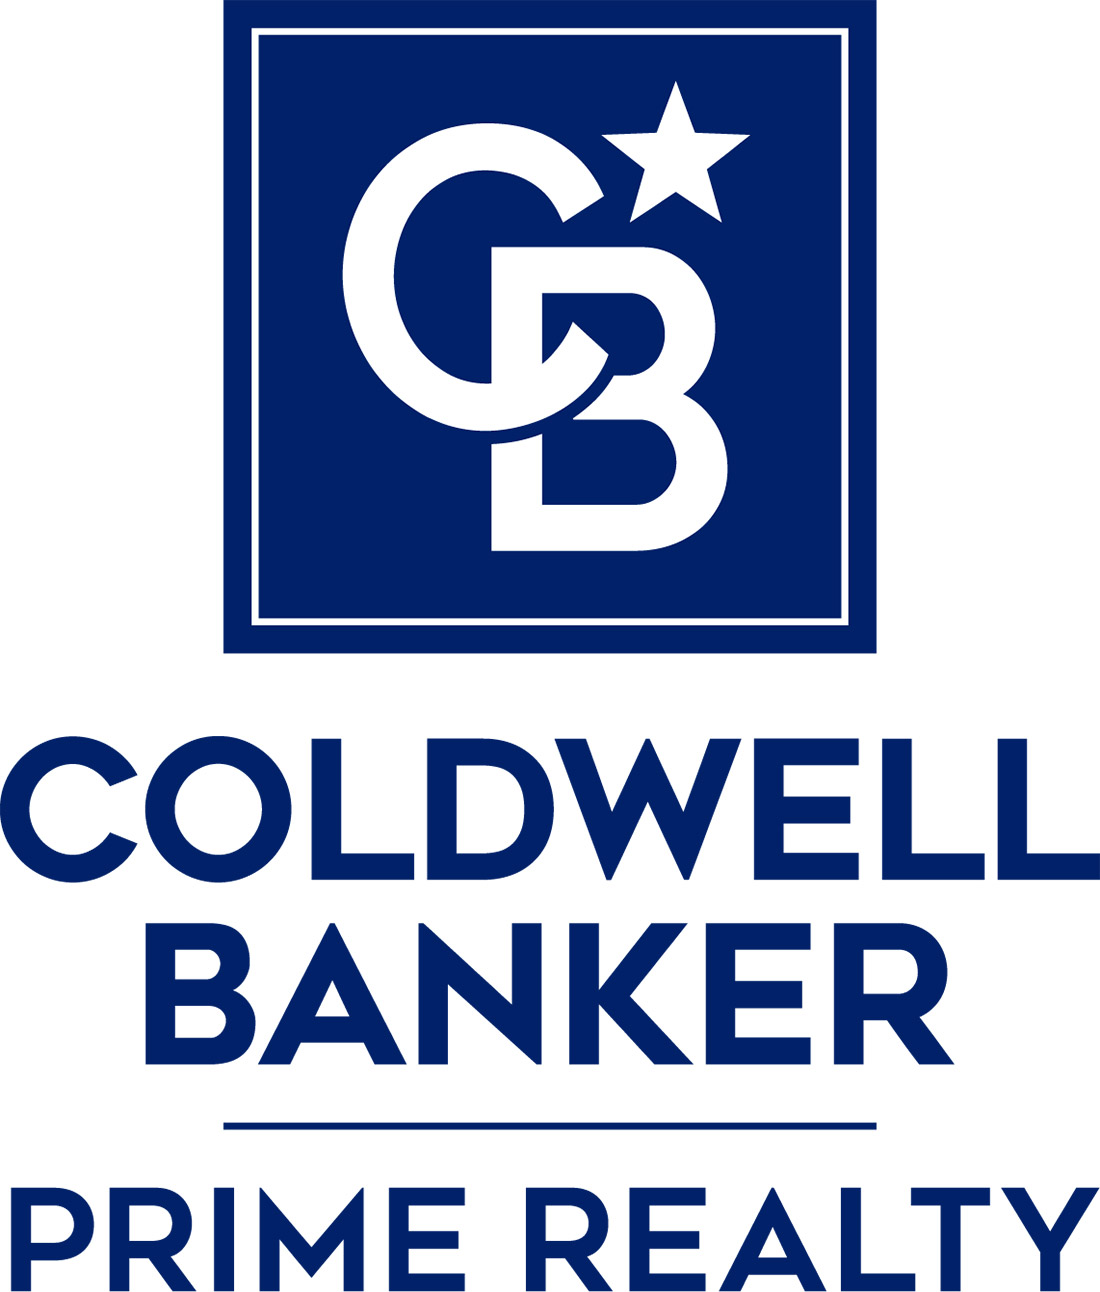 Trez Hannah - Coldwell Banker Prime Realty - Carbondale, IL Logo